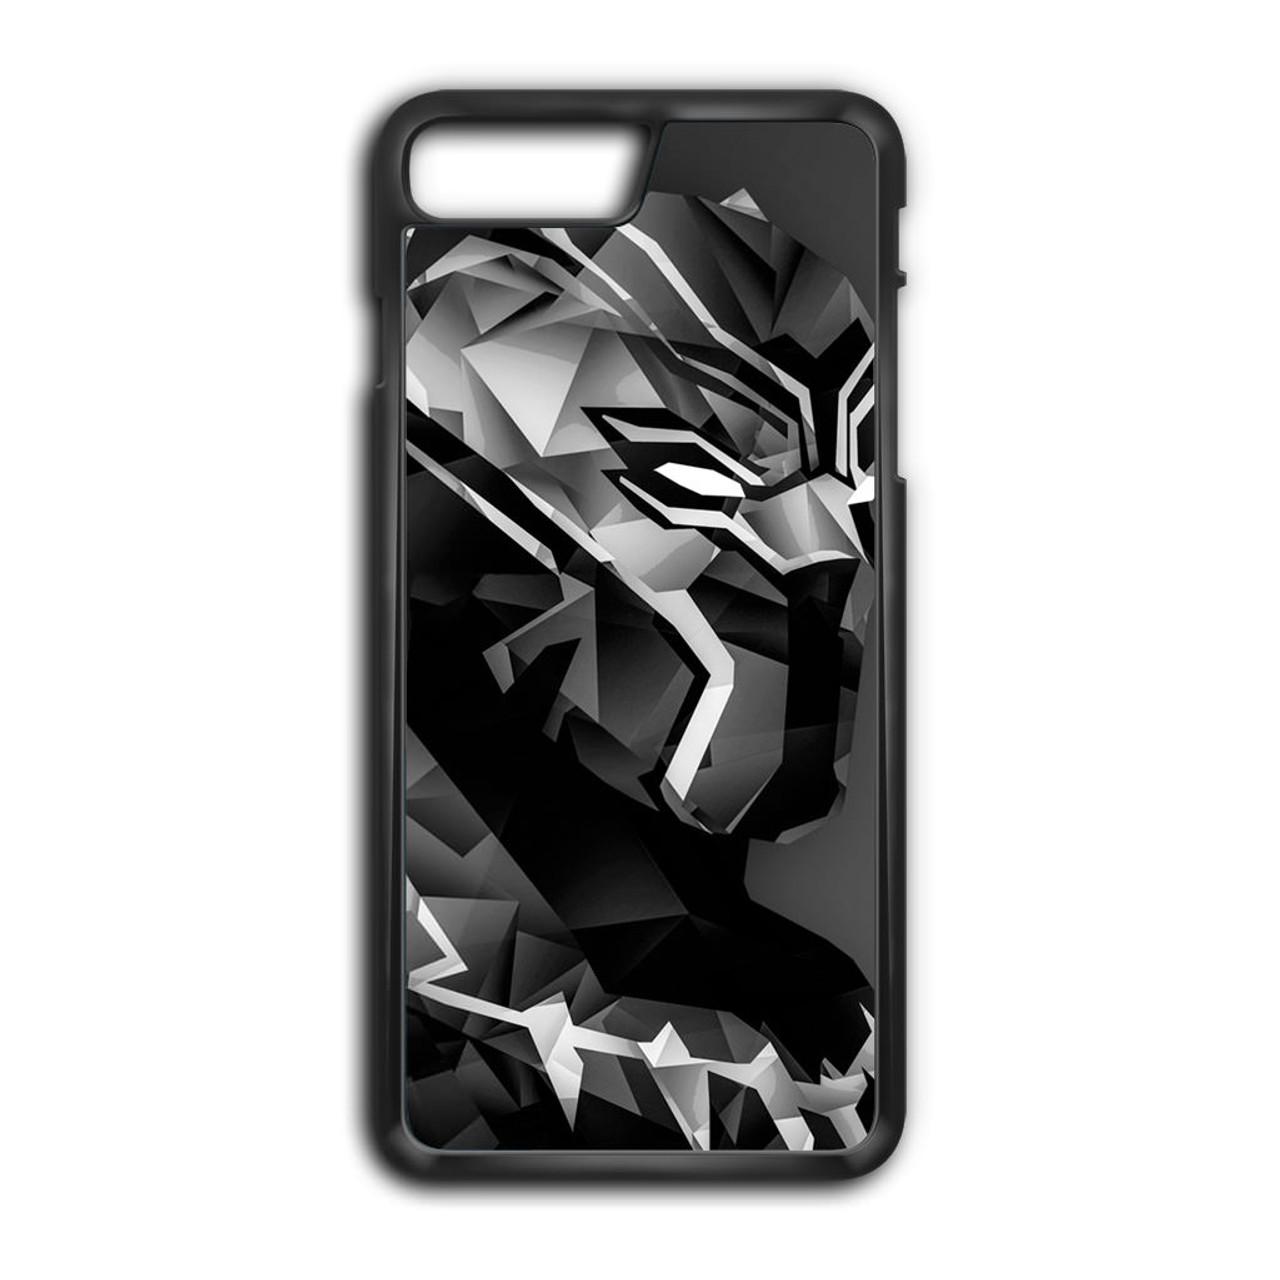 art iphone 7 case